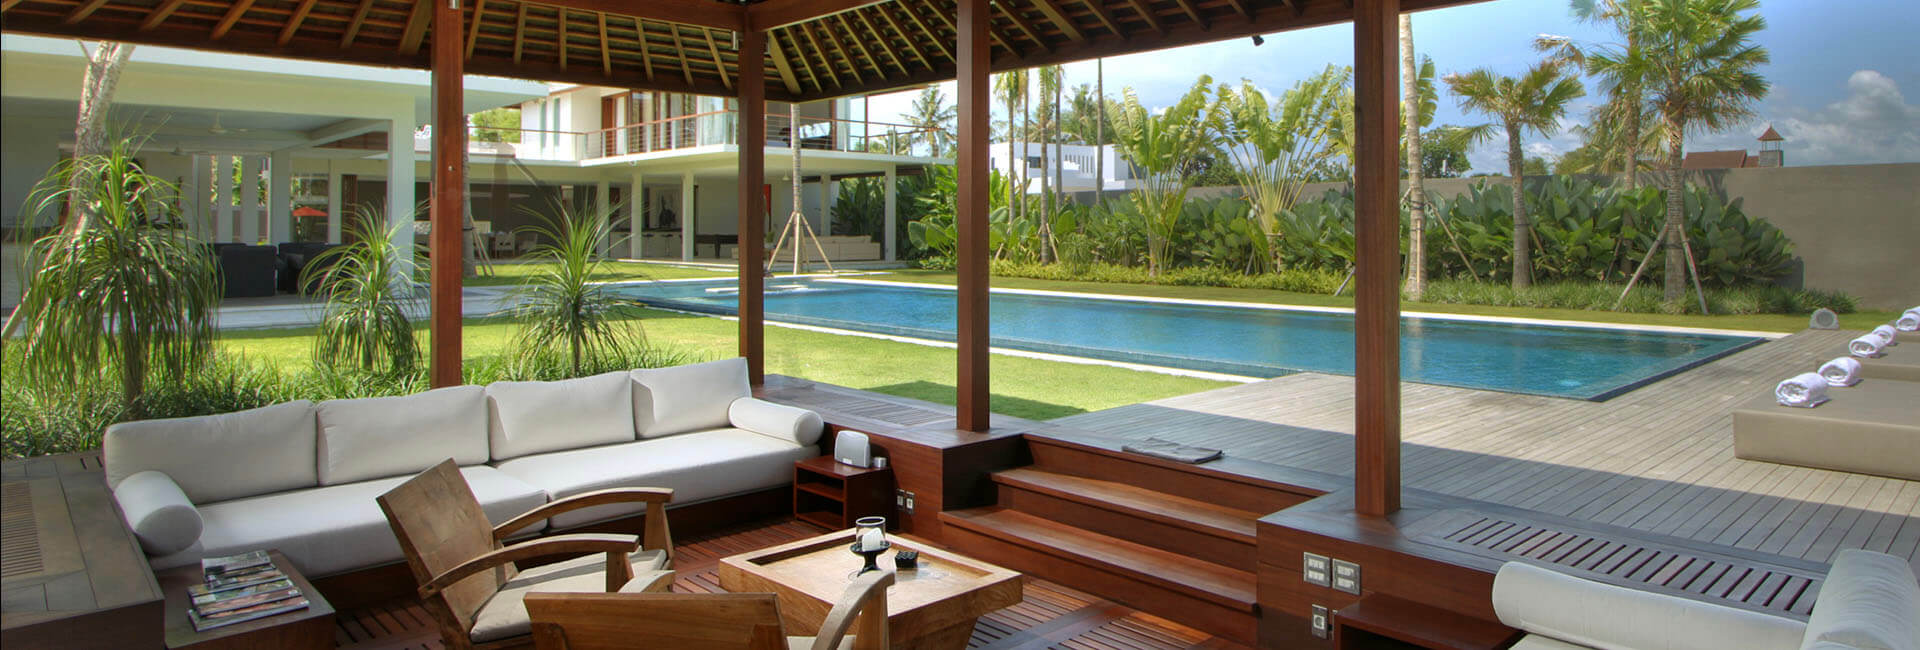 Guest Reviews   Villa Kalyani - Canggu 5 bedroom luxury